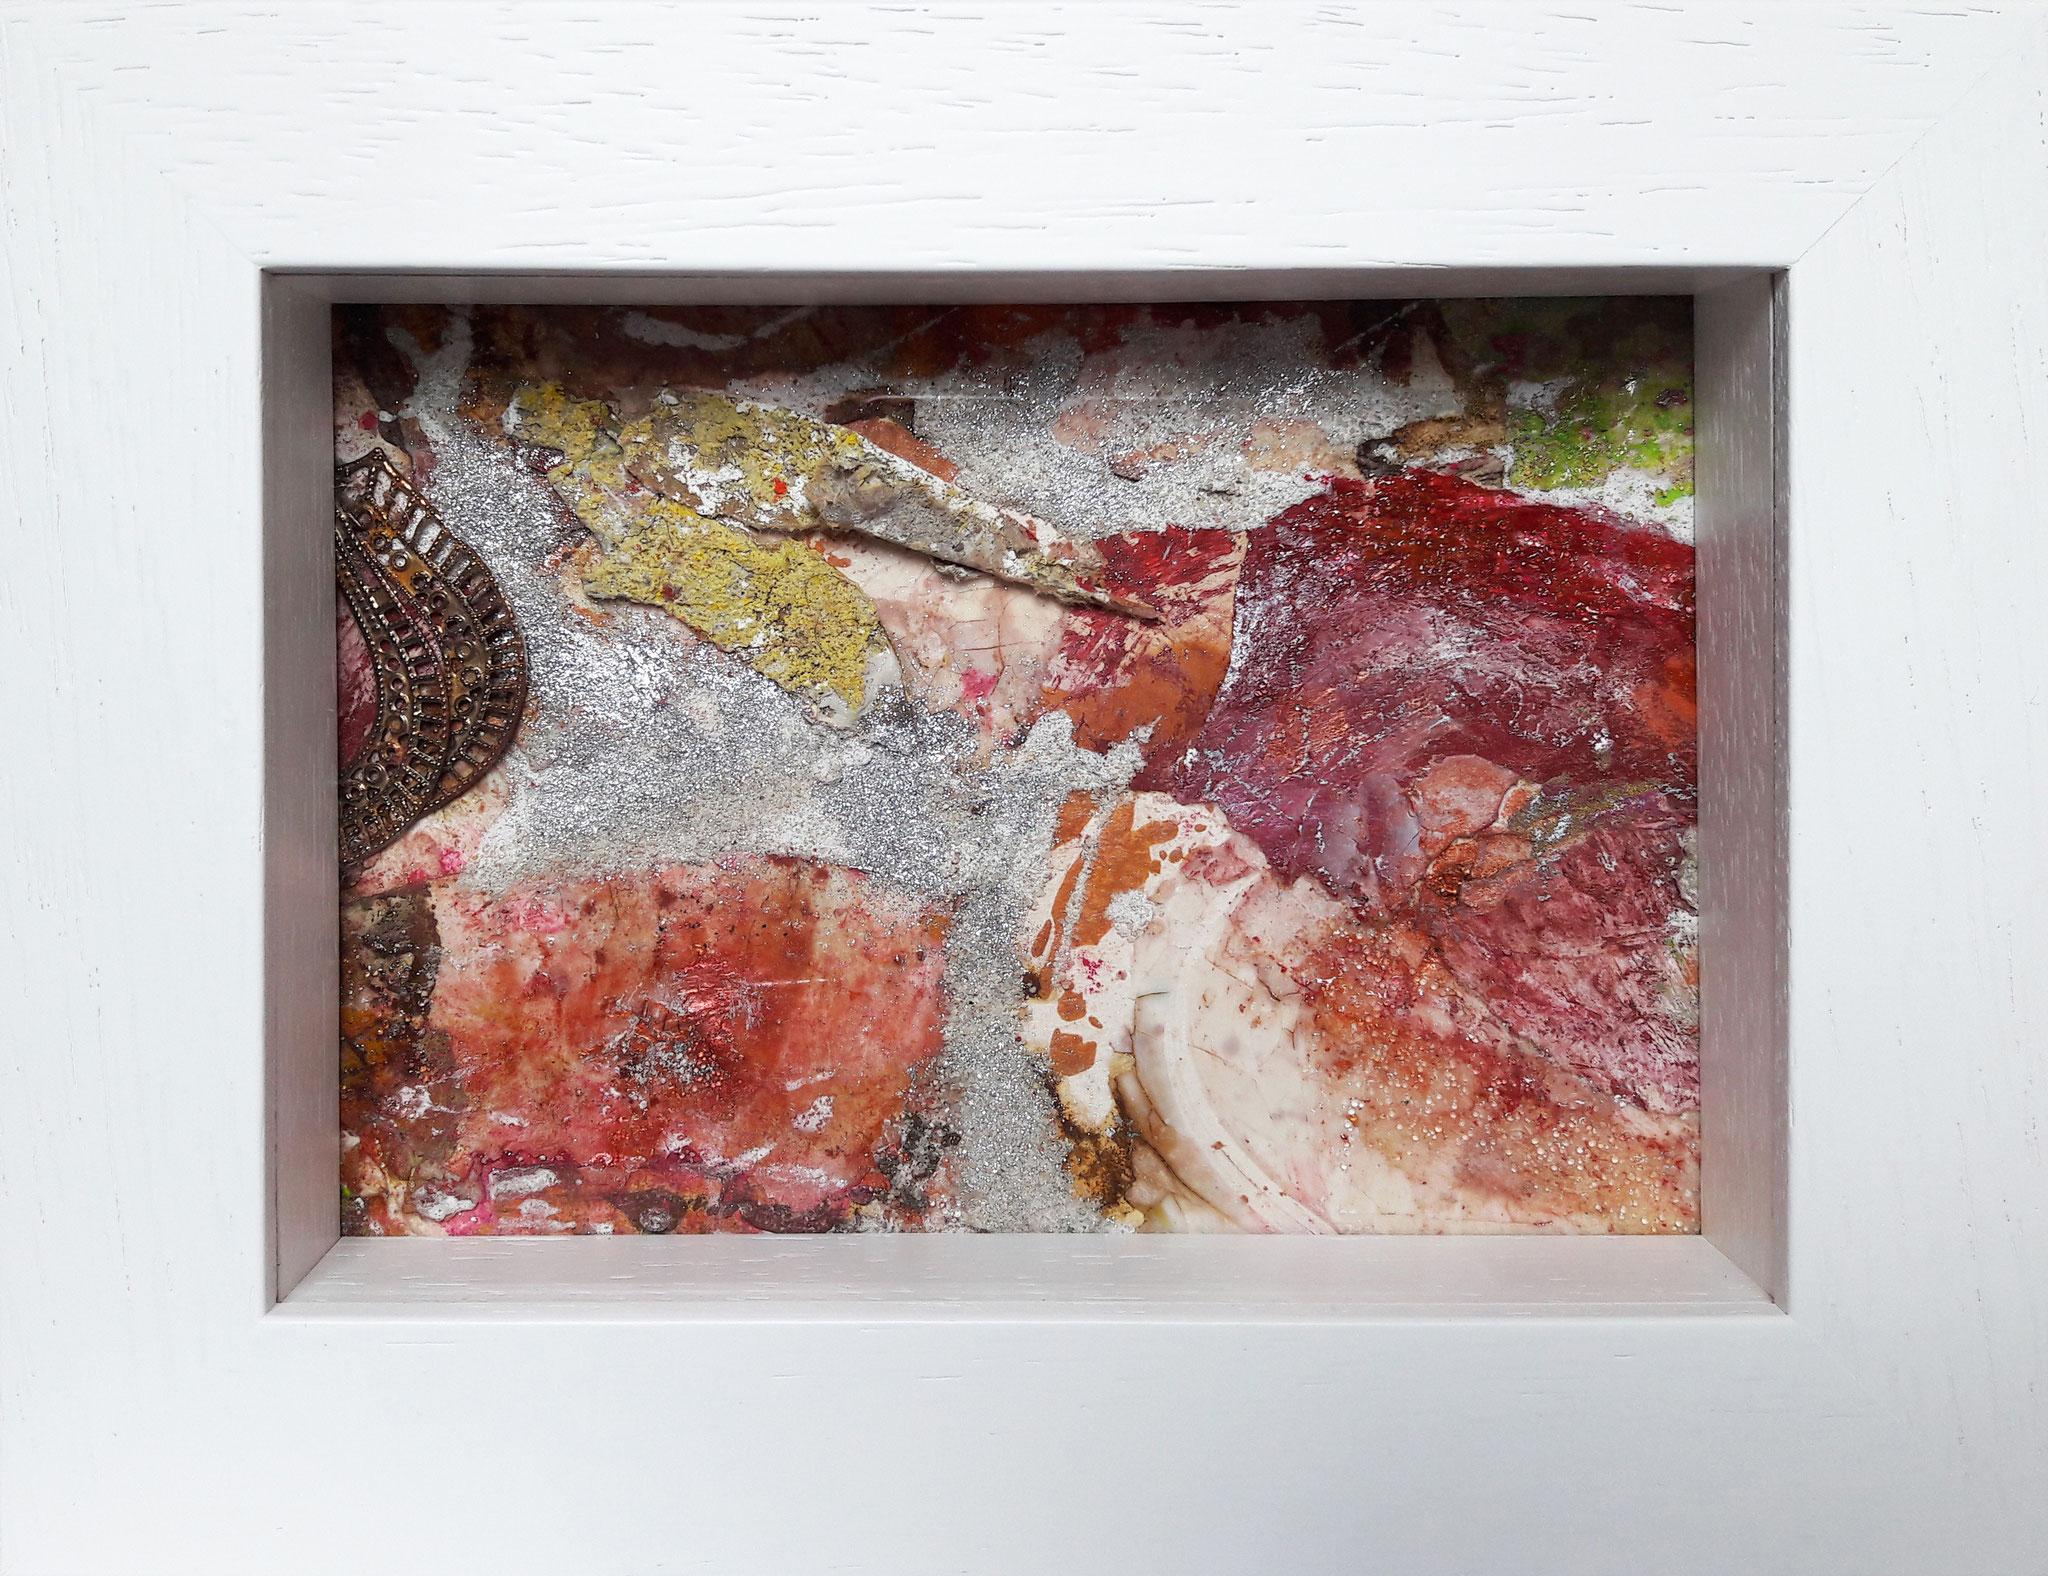 Papperlapapp 3, Acrylmischtechnik, 23 x 18 mit Rahmen, 2017, verkauft